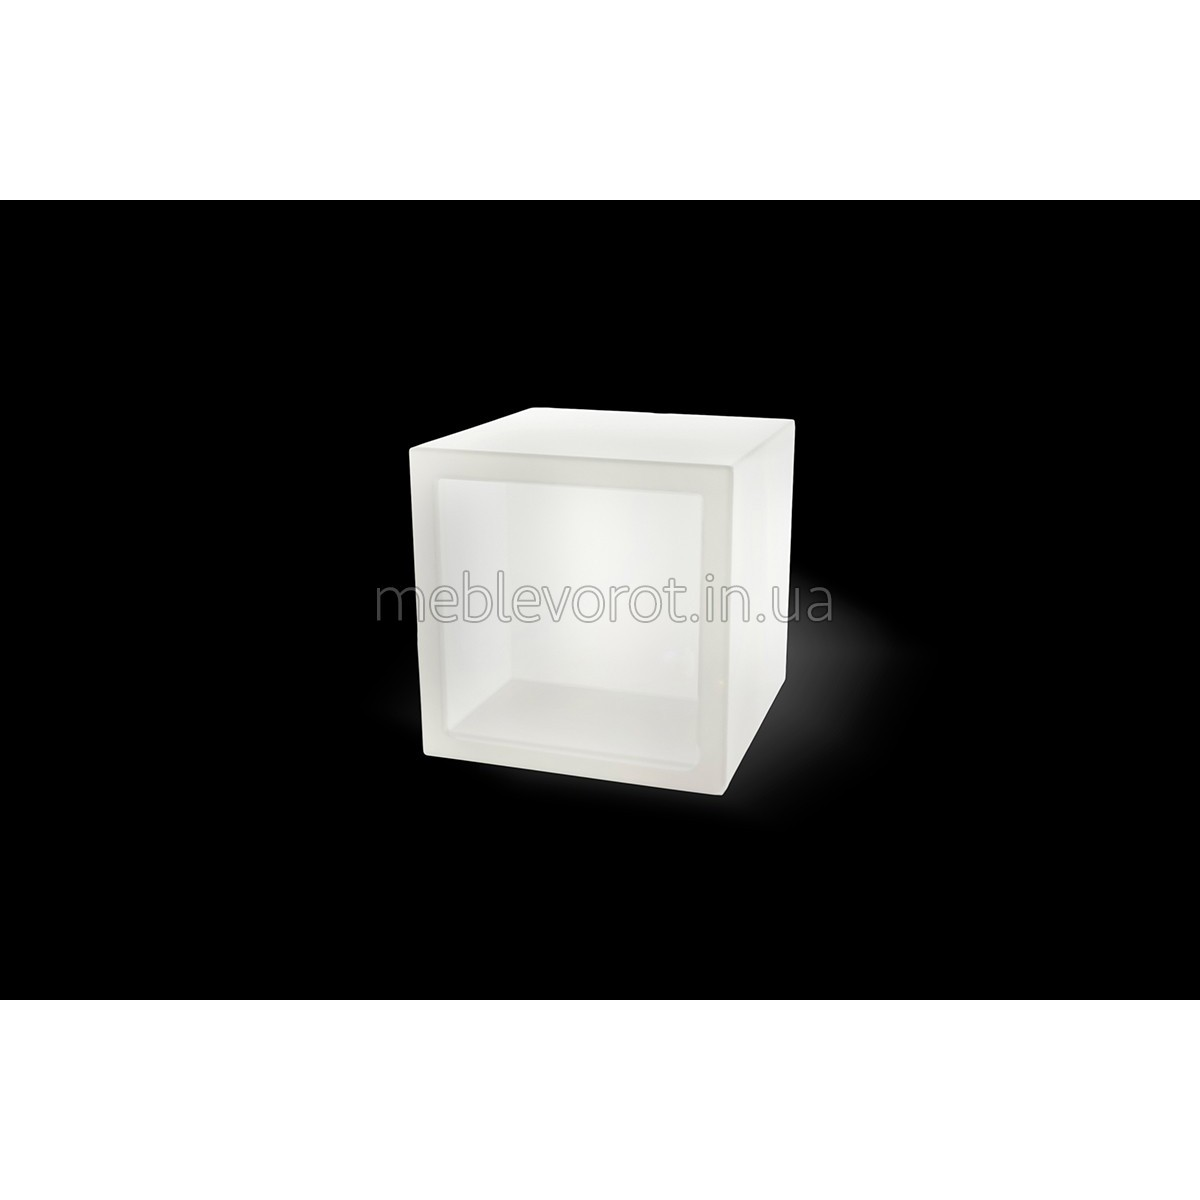 LED Куб с нишей (Аренда)